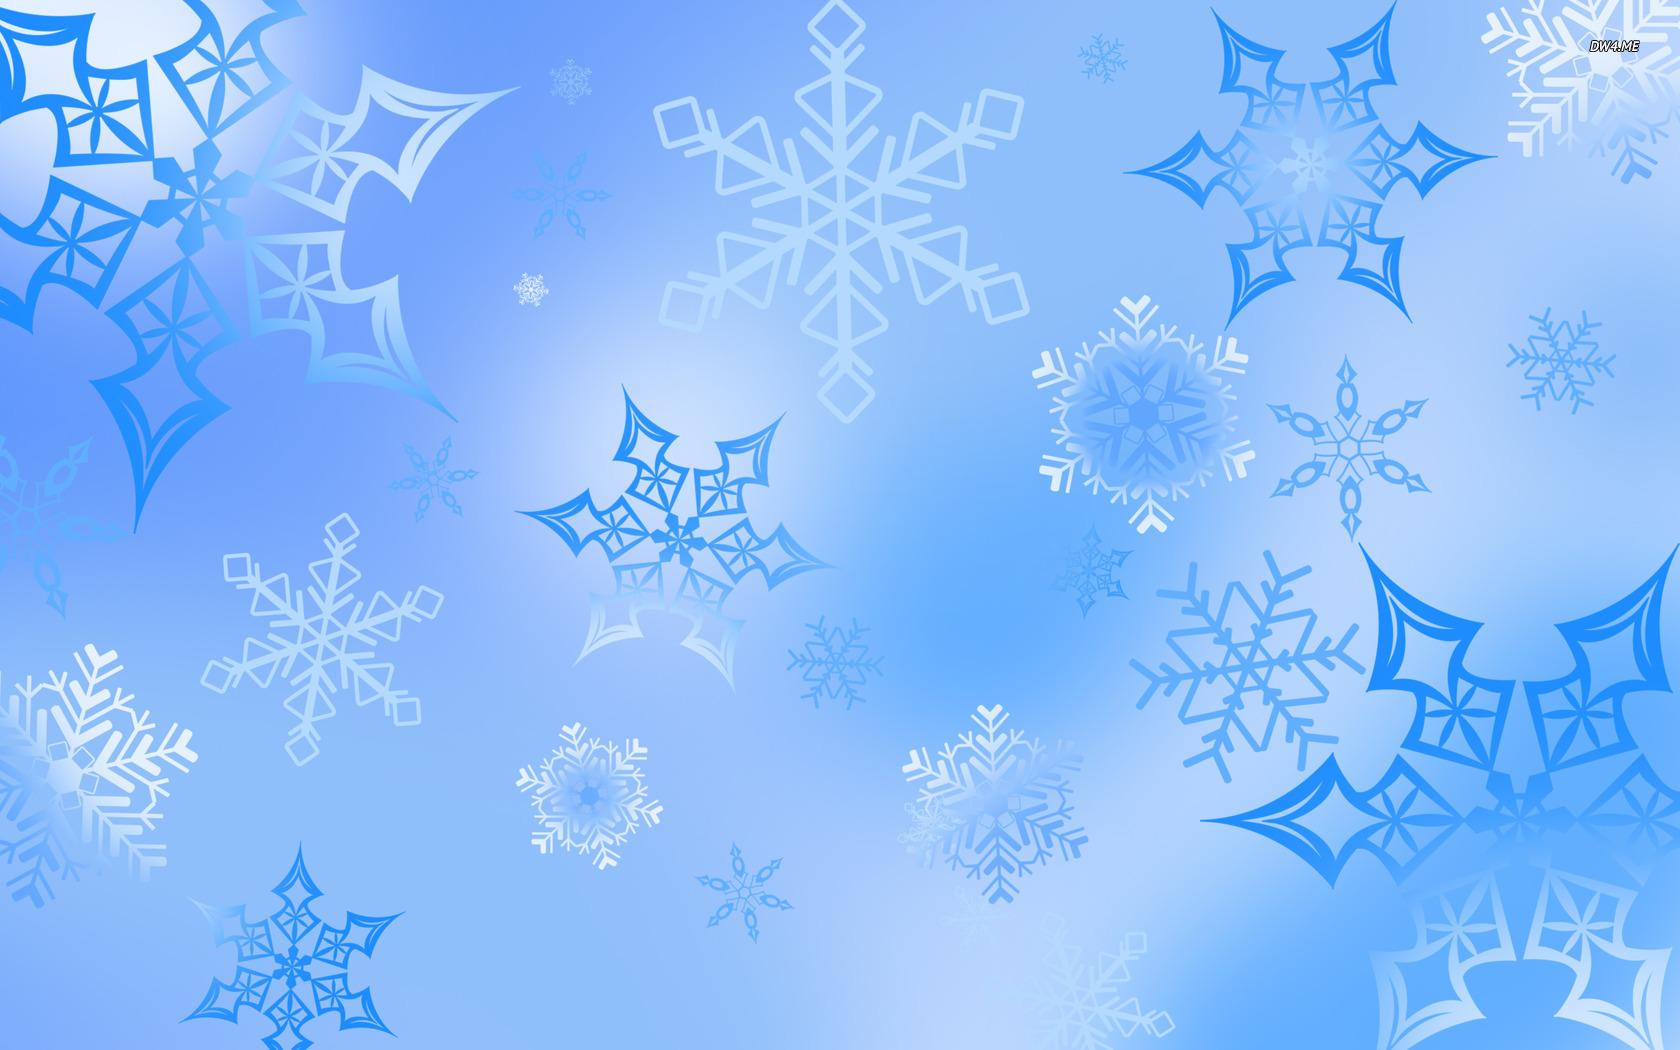 Animated Christmas Wallpaper Snow Falling - WallpaperSafari